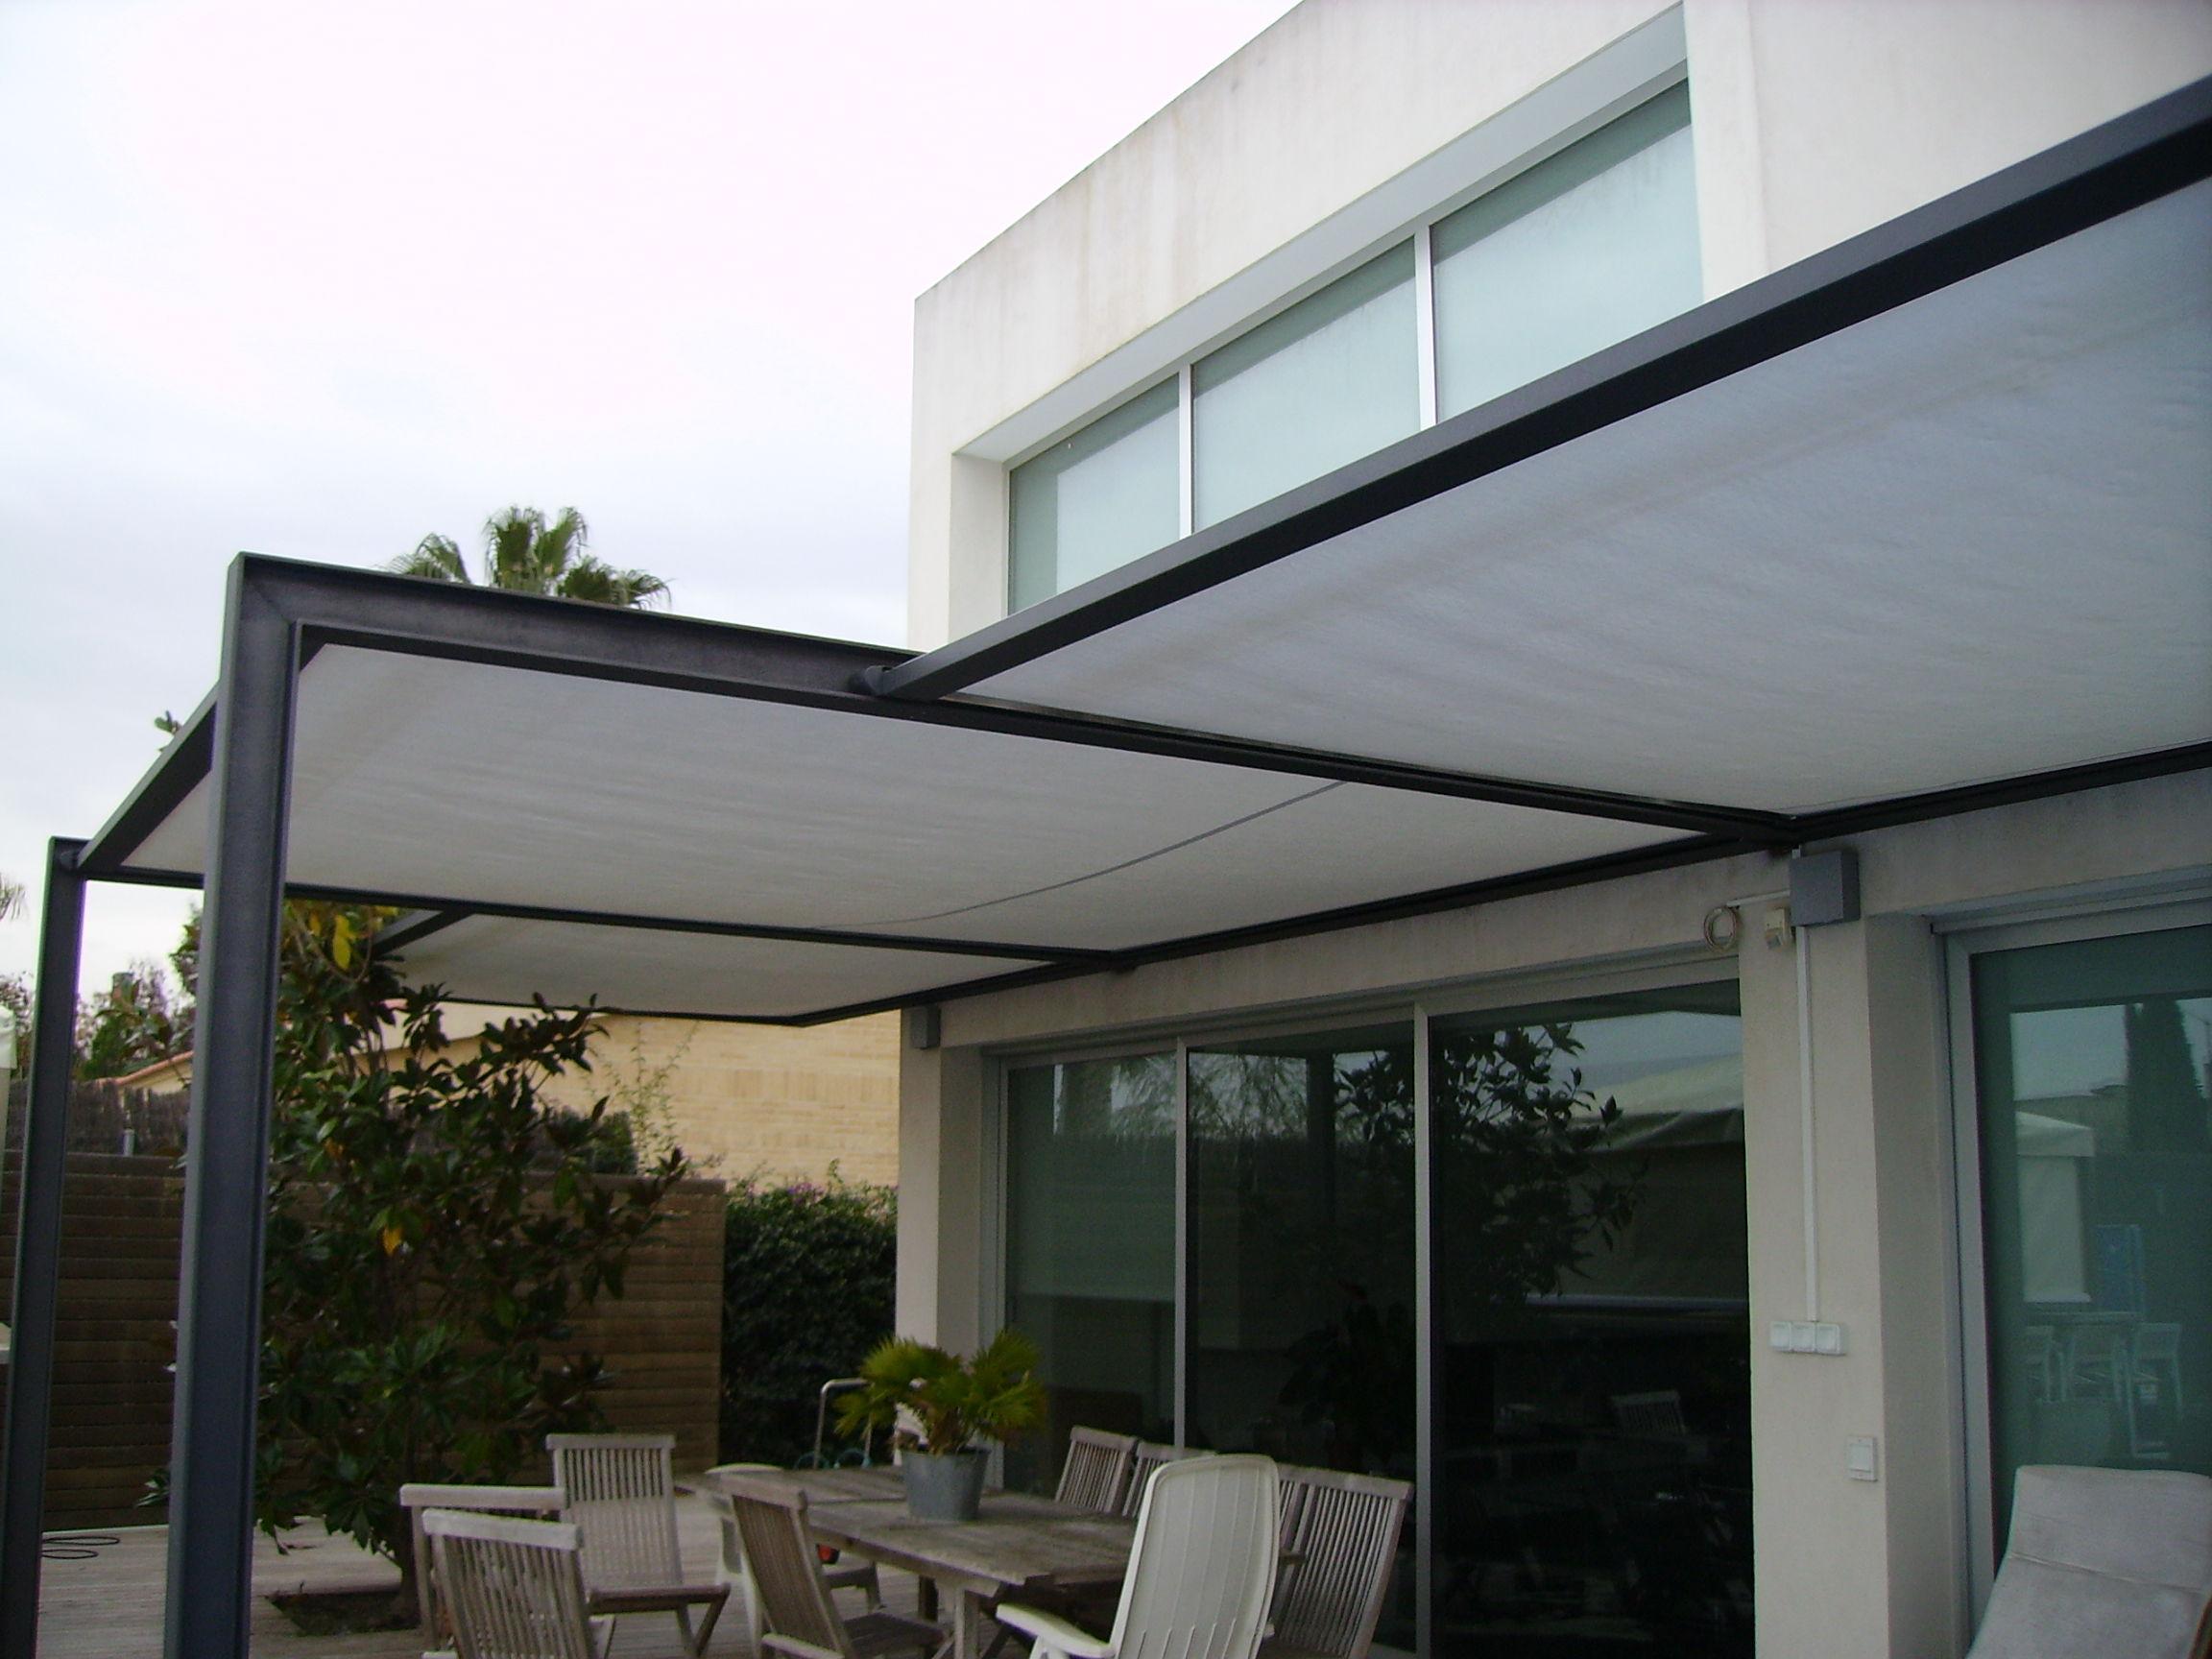 7 toldos para cubrir veranda acristaladas cat logo de for Perfiles de aluminio para toldos correderos